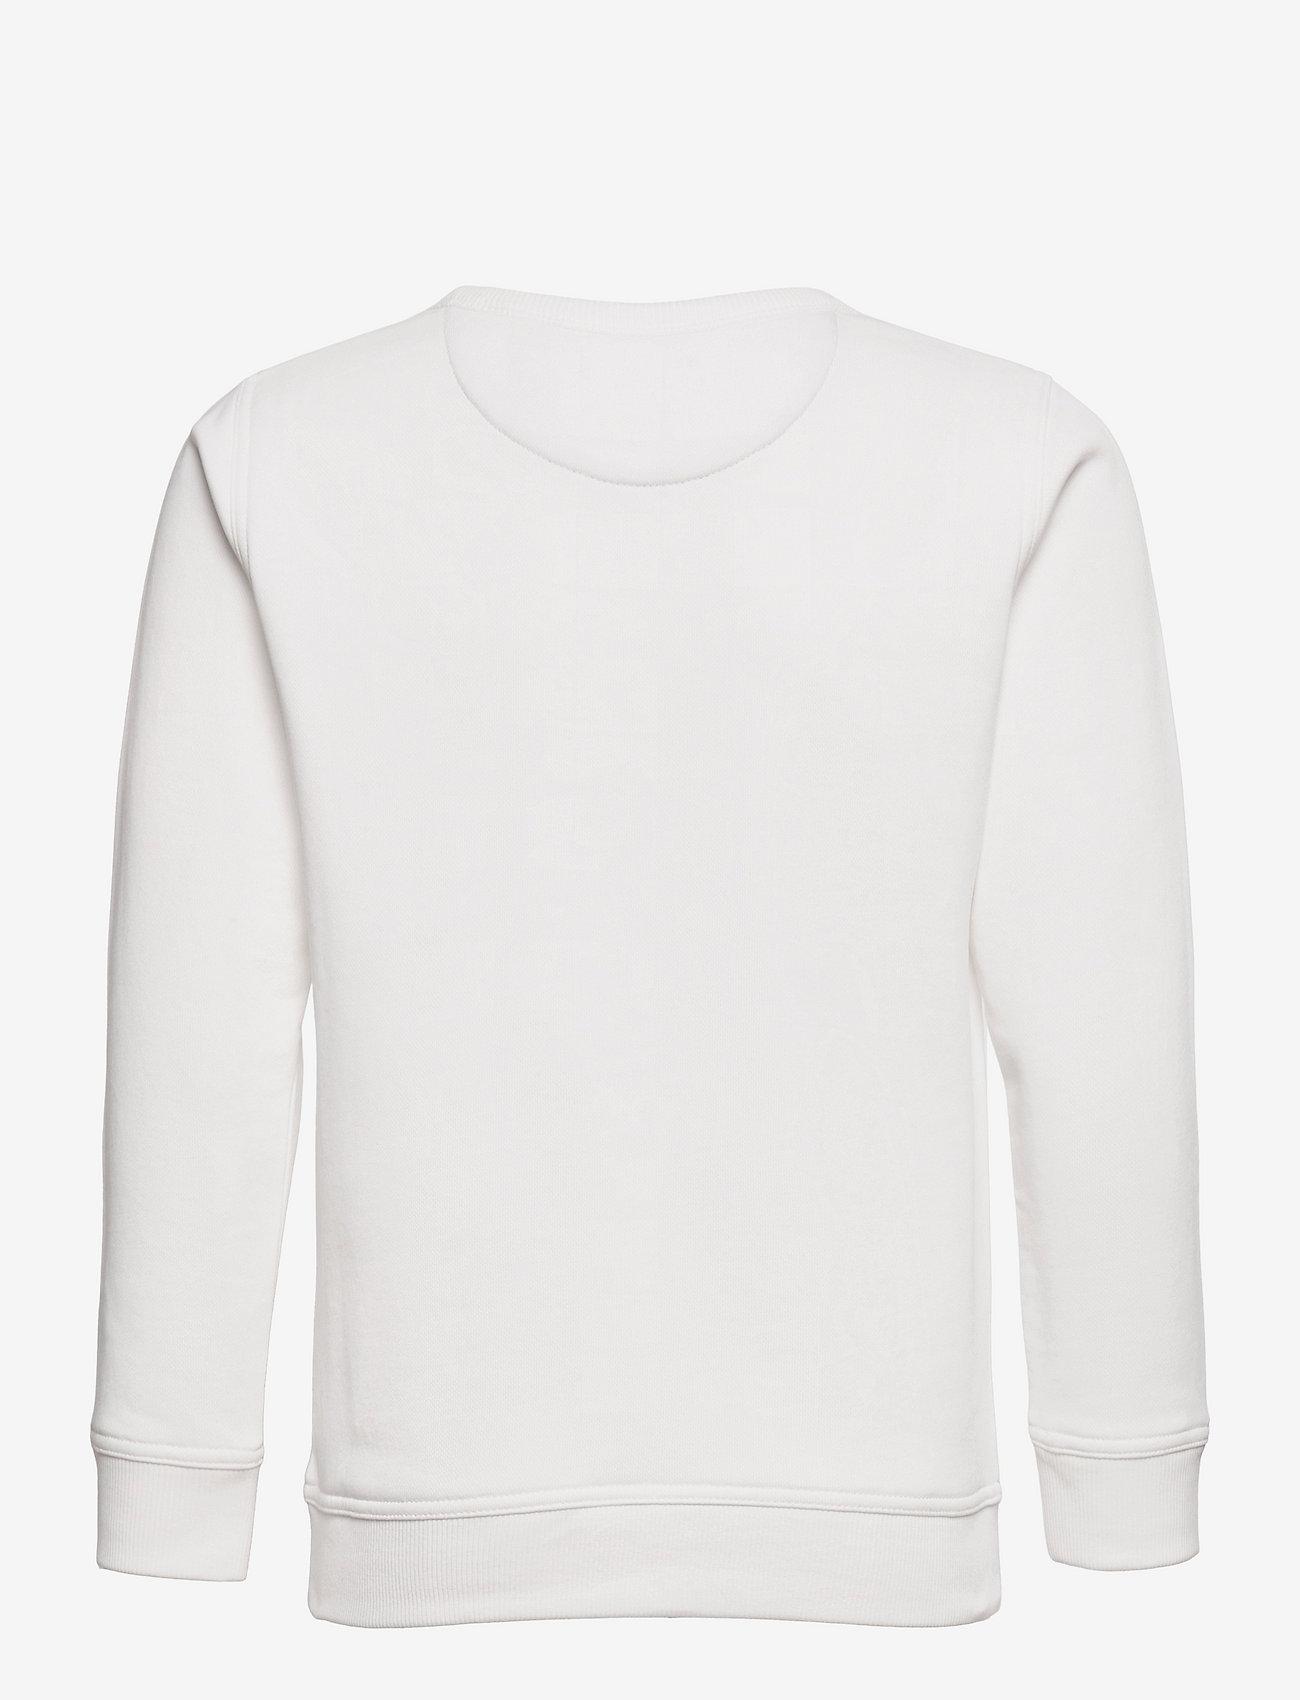 GANT - ARCHIVE SHIELD EMB C-NECK - sweatshirts - eggshell - 1